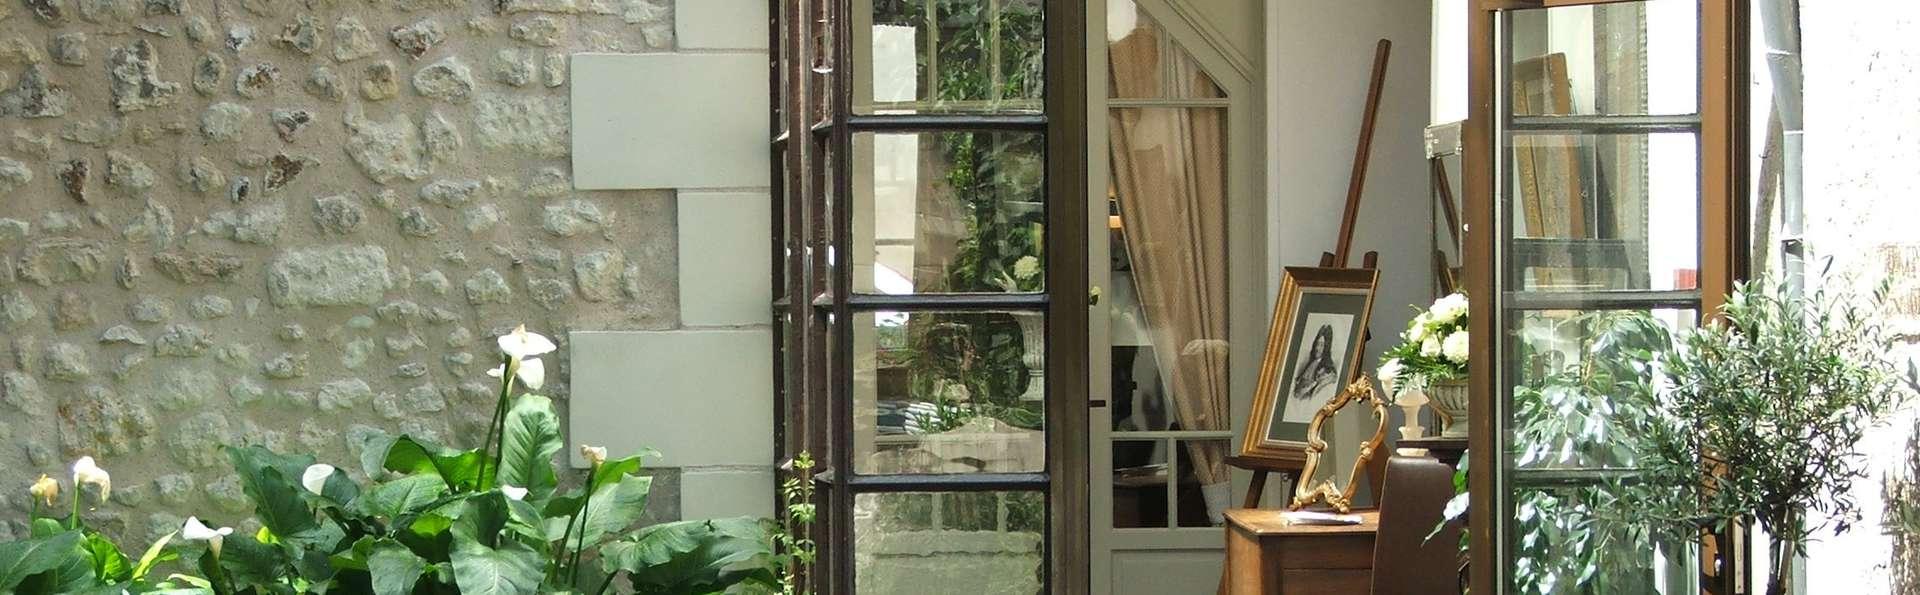 hotel le grand monarque centre hotel azay le rideau. Black Bedroom Furniture Sets. Home Design Ideas